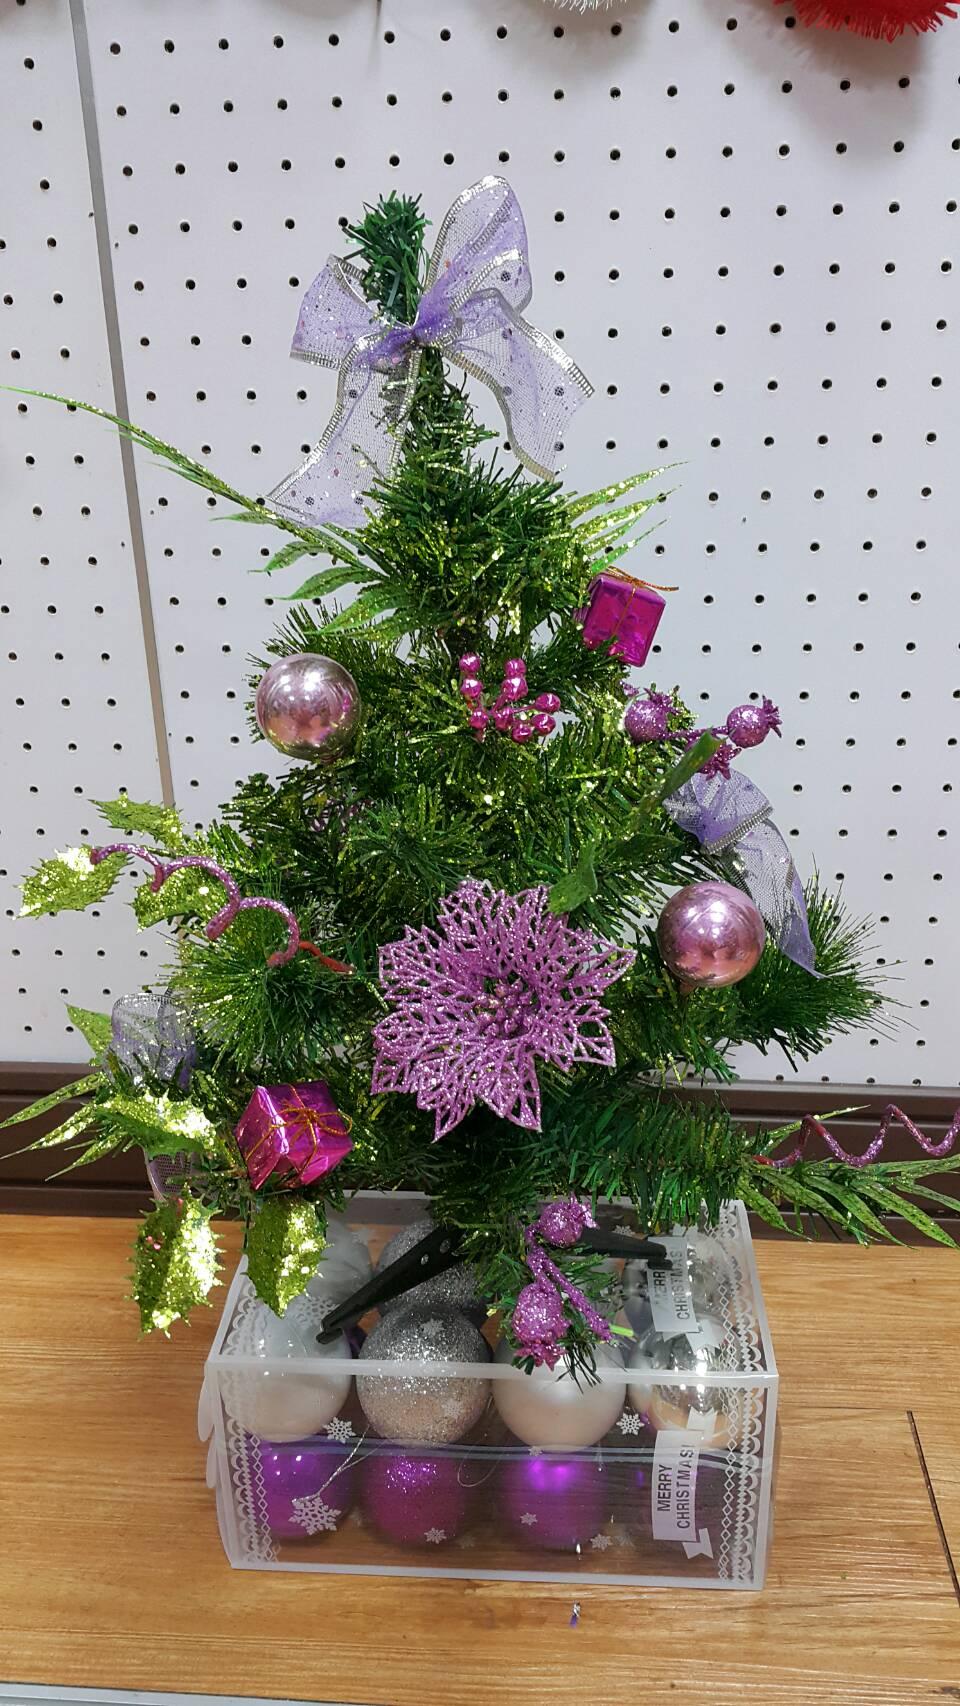 X射線【X454097】40cm裝飾聖誕樹(紫),聖誕樹/聖誕佈置/聖誕燈/會場佈置/材料包/成品樹/小樹